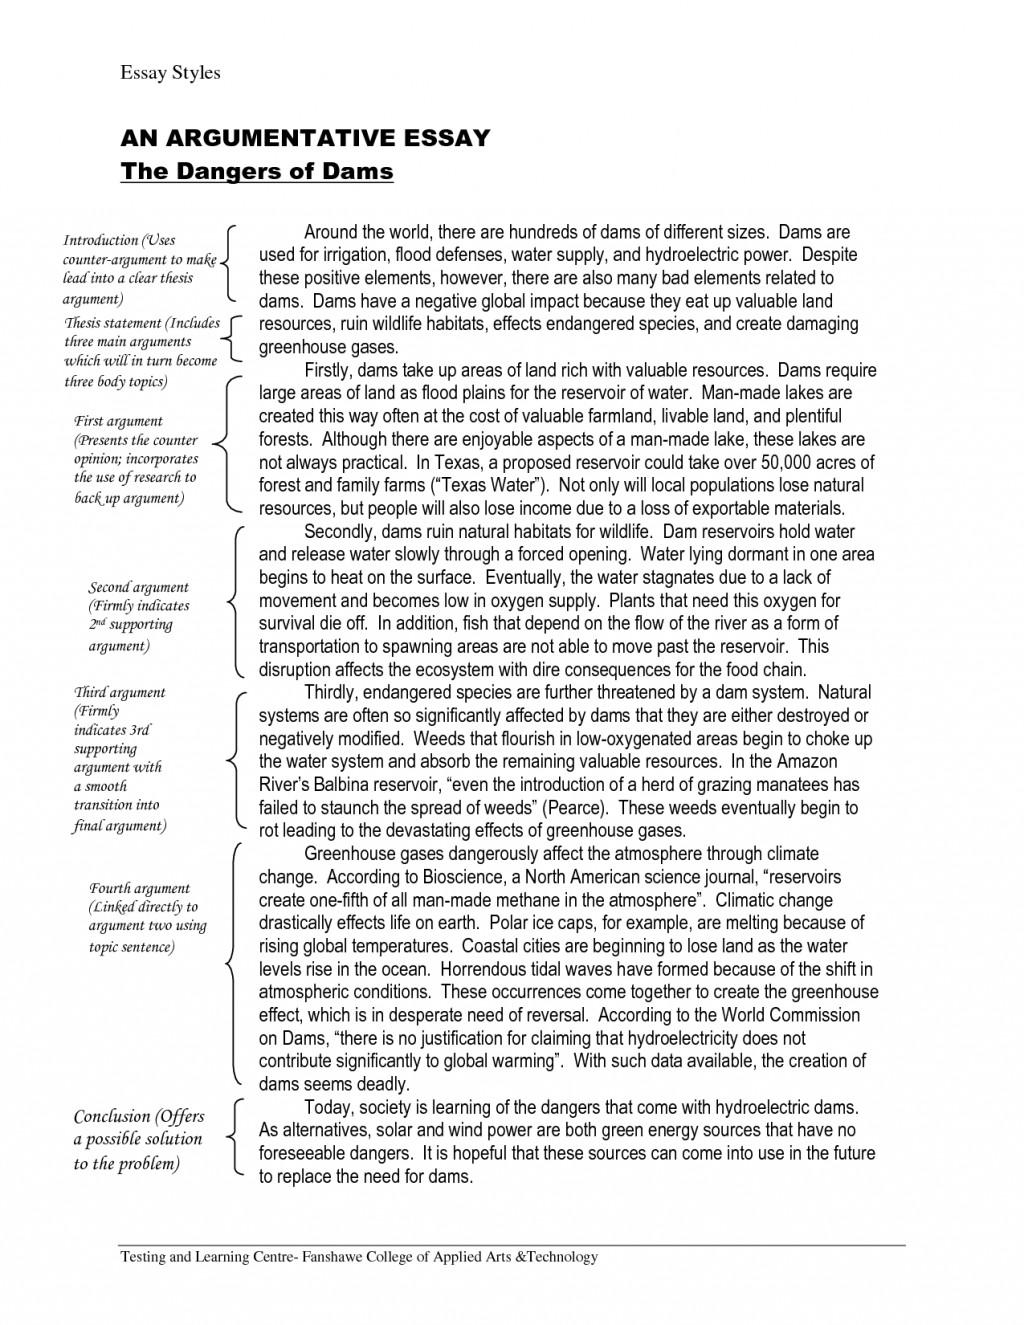 008 Bco7lvomsg Argumentative Essay Sample Dreaded Template College Middle School Persuasive Writing Grade 7 Large